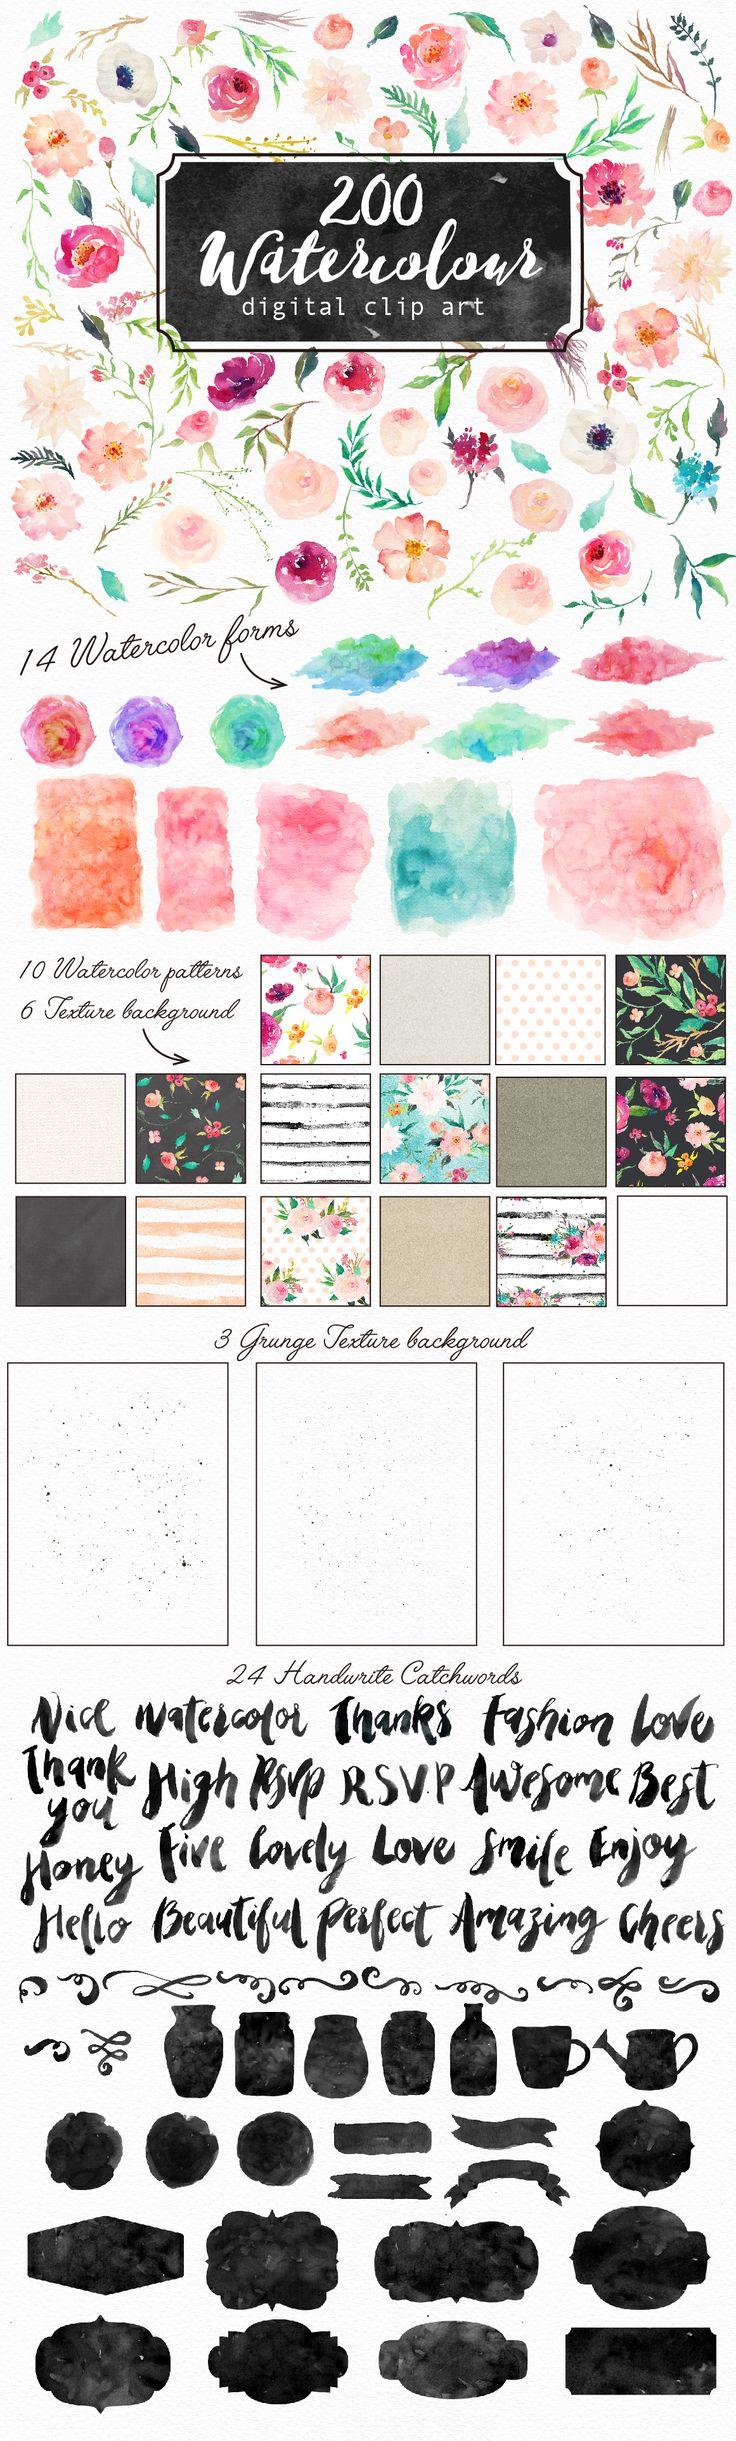 best images about pastel on Pinterest